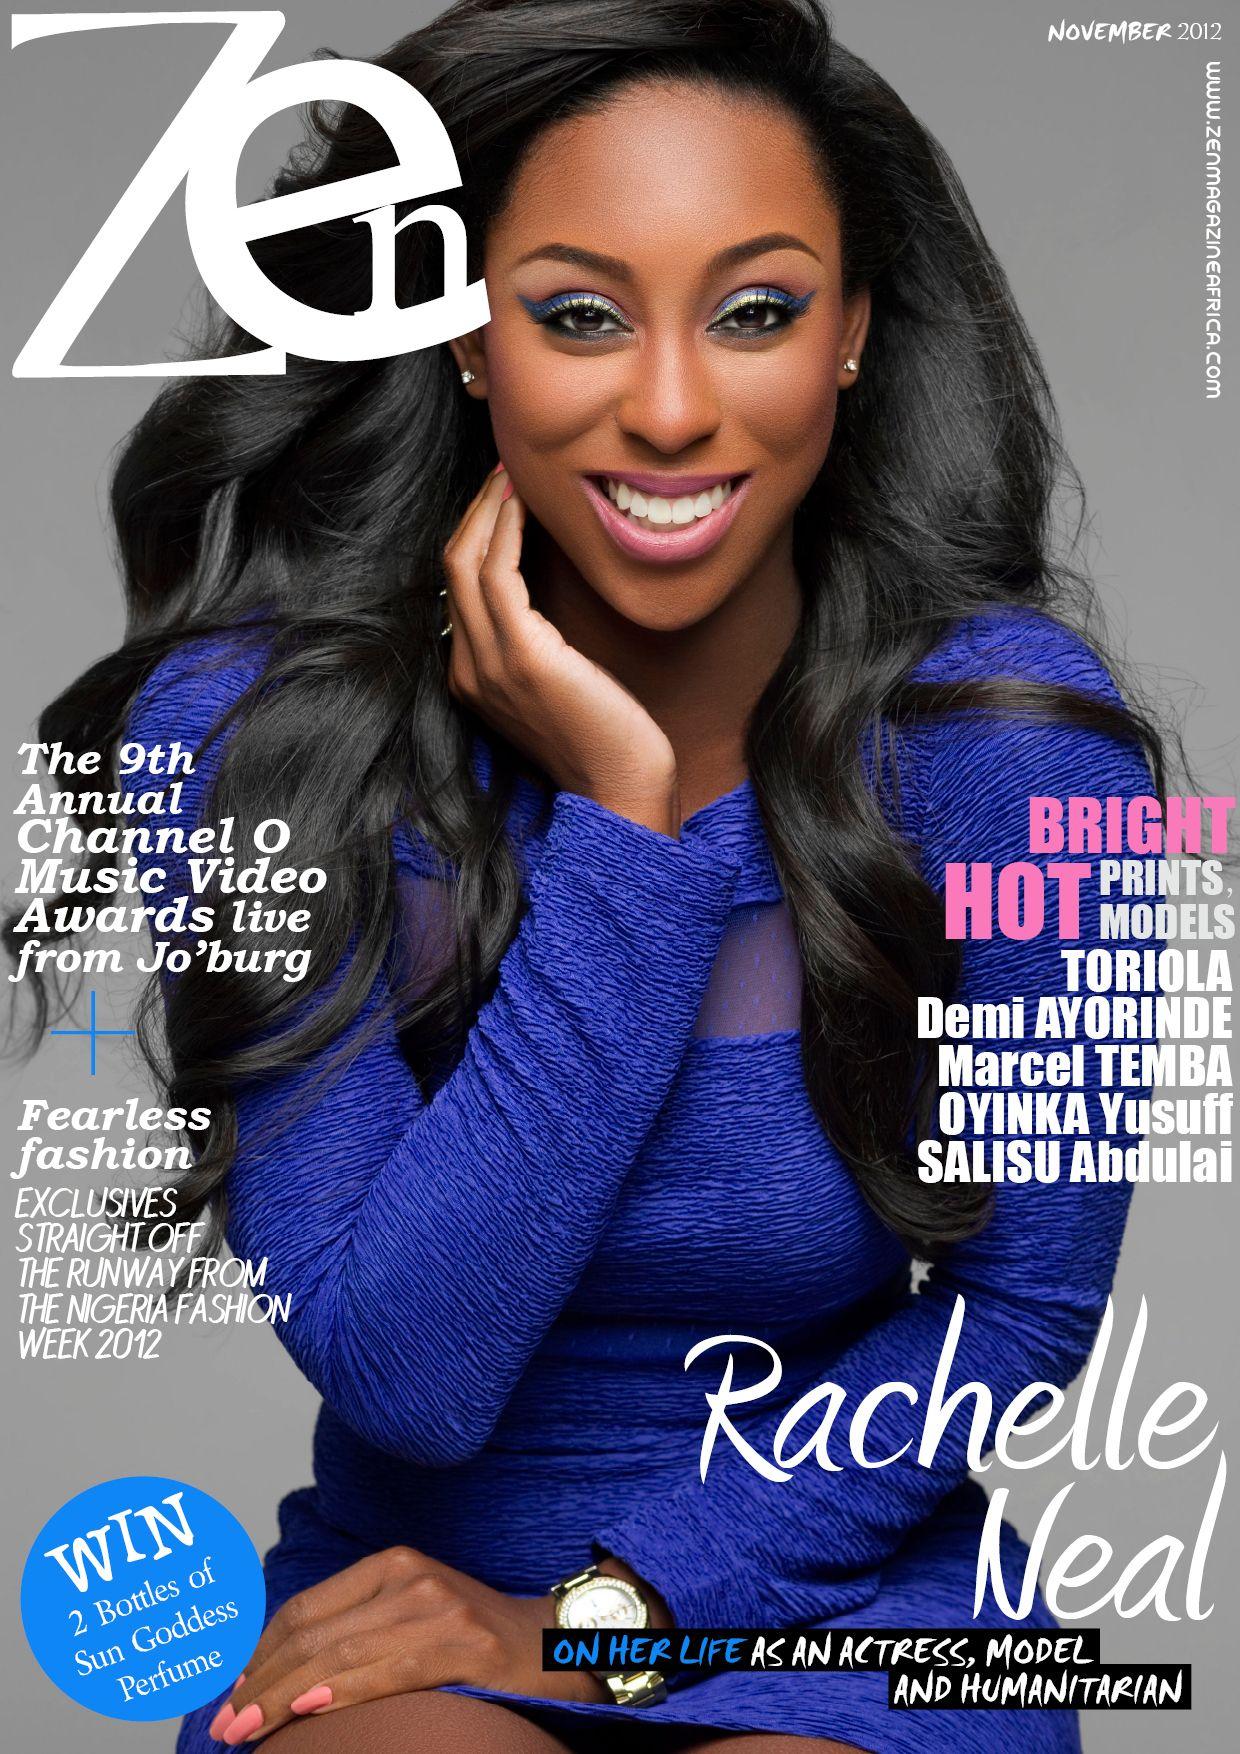 Color zen magazine - Zen Magazine November Cover Is Rachelle Neal